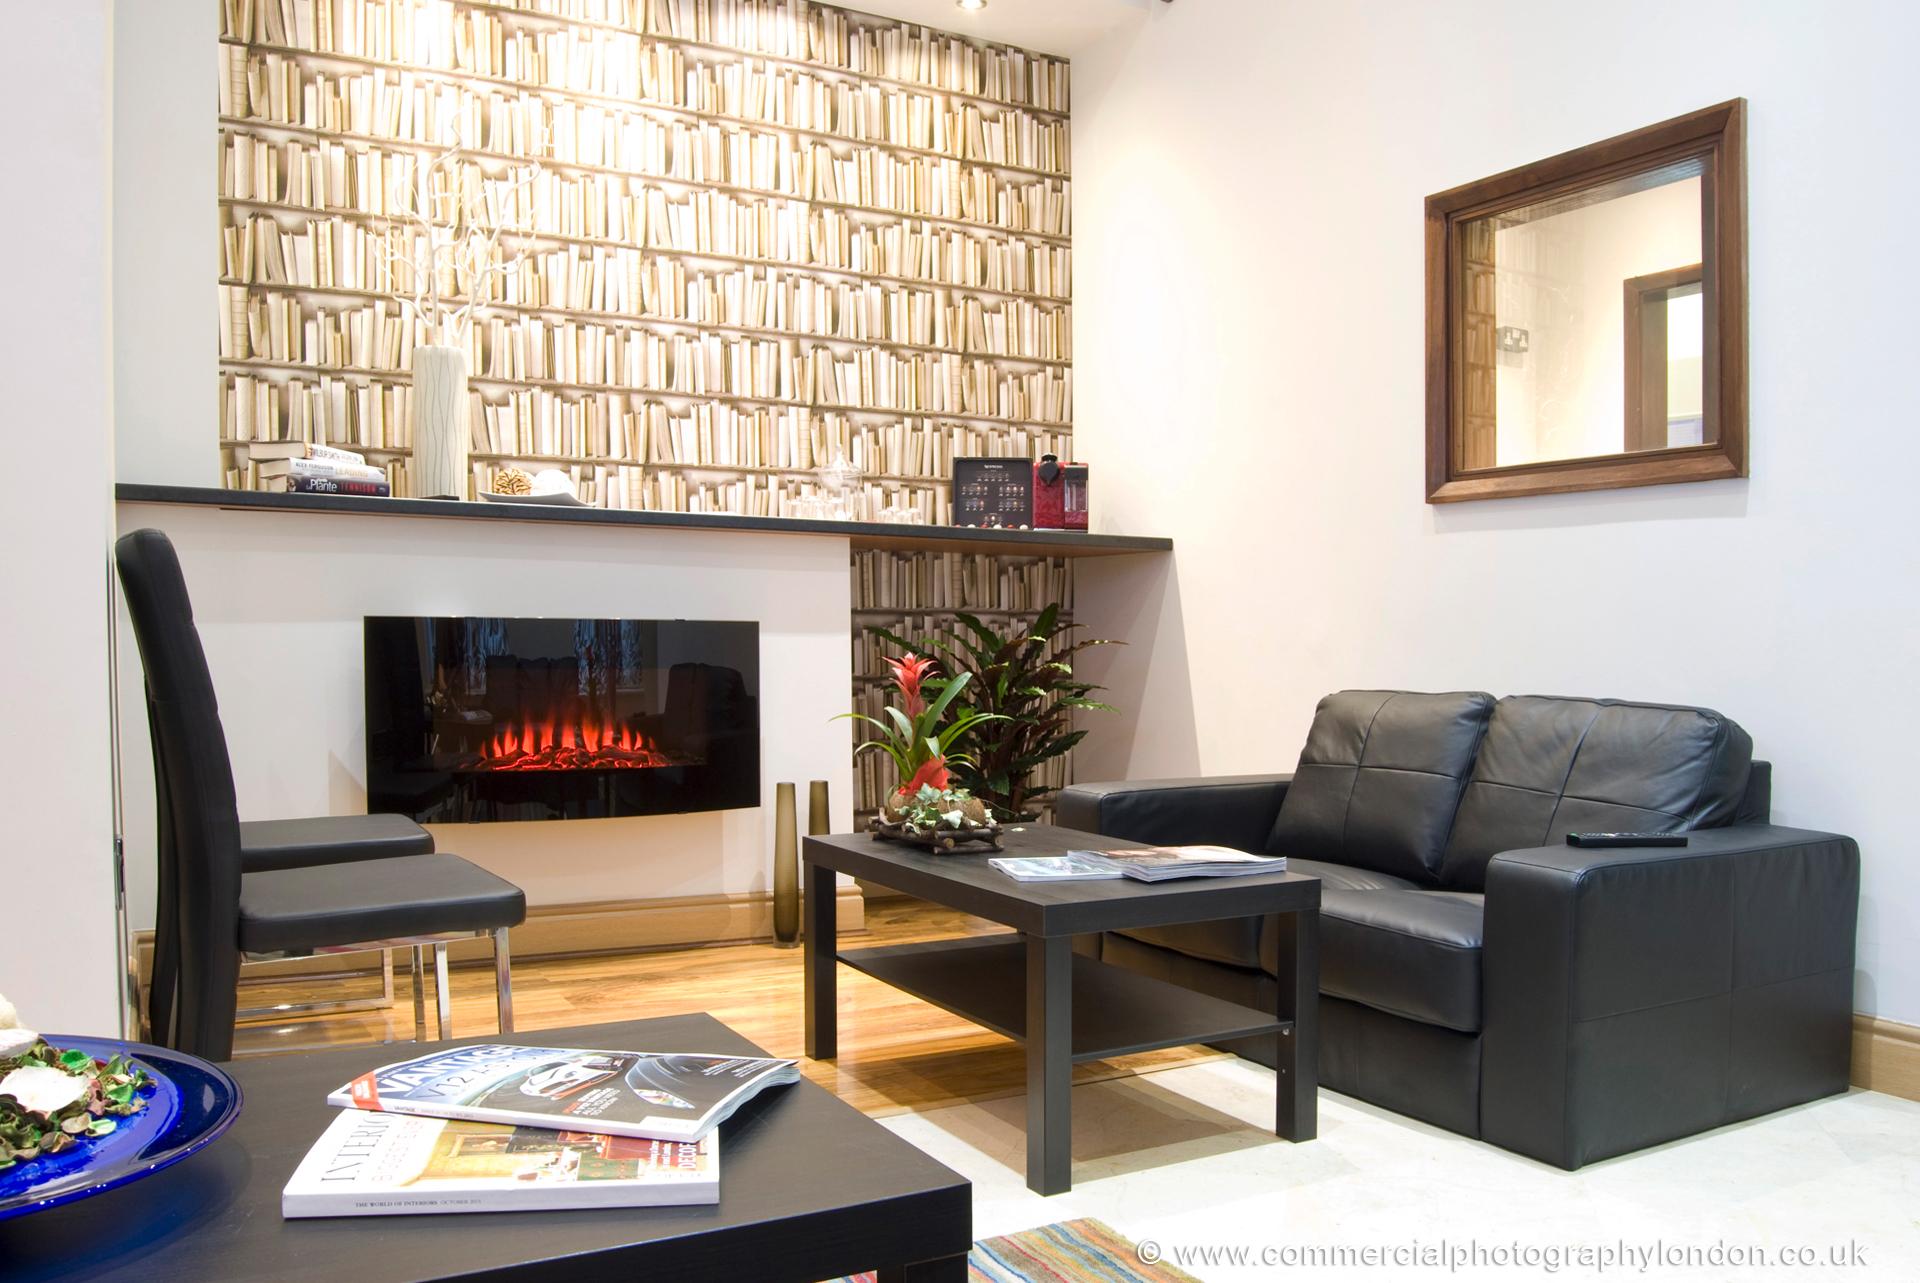 Interiors Photographer London portfolio photo 4325 by Commercial Photography London